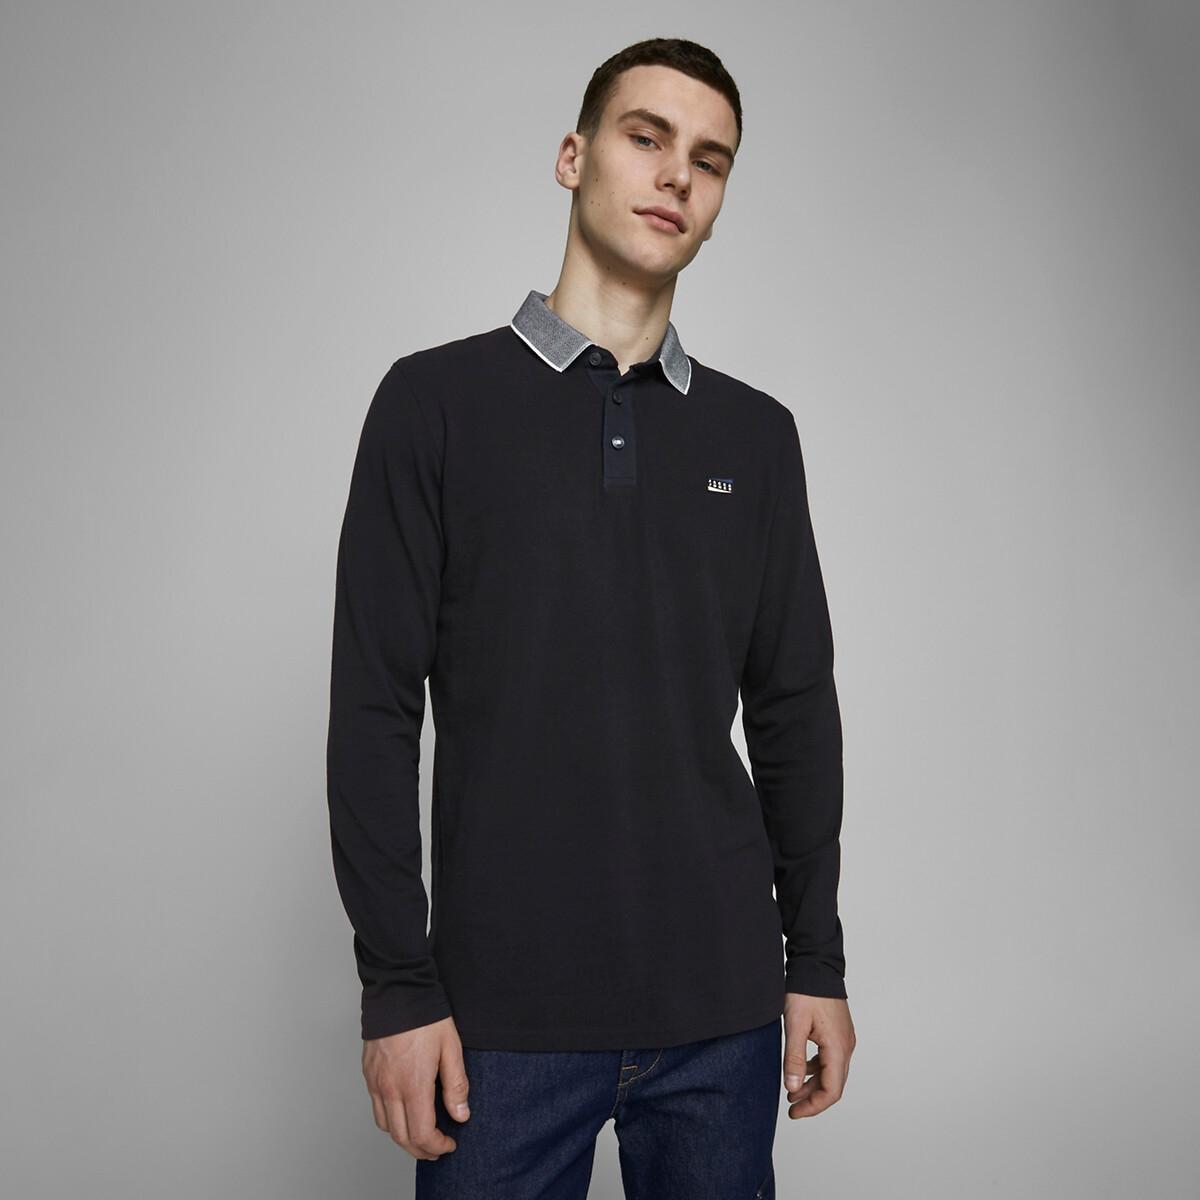 Футболка-поло La Redoute С длинными рукавами Charming S синий блуза la redoute с рисунком и длинными рукавами s синий